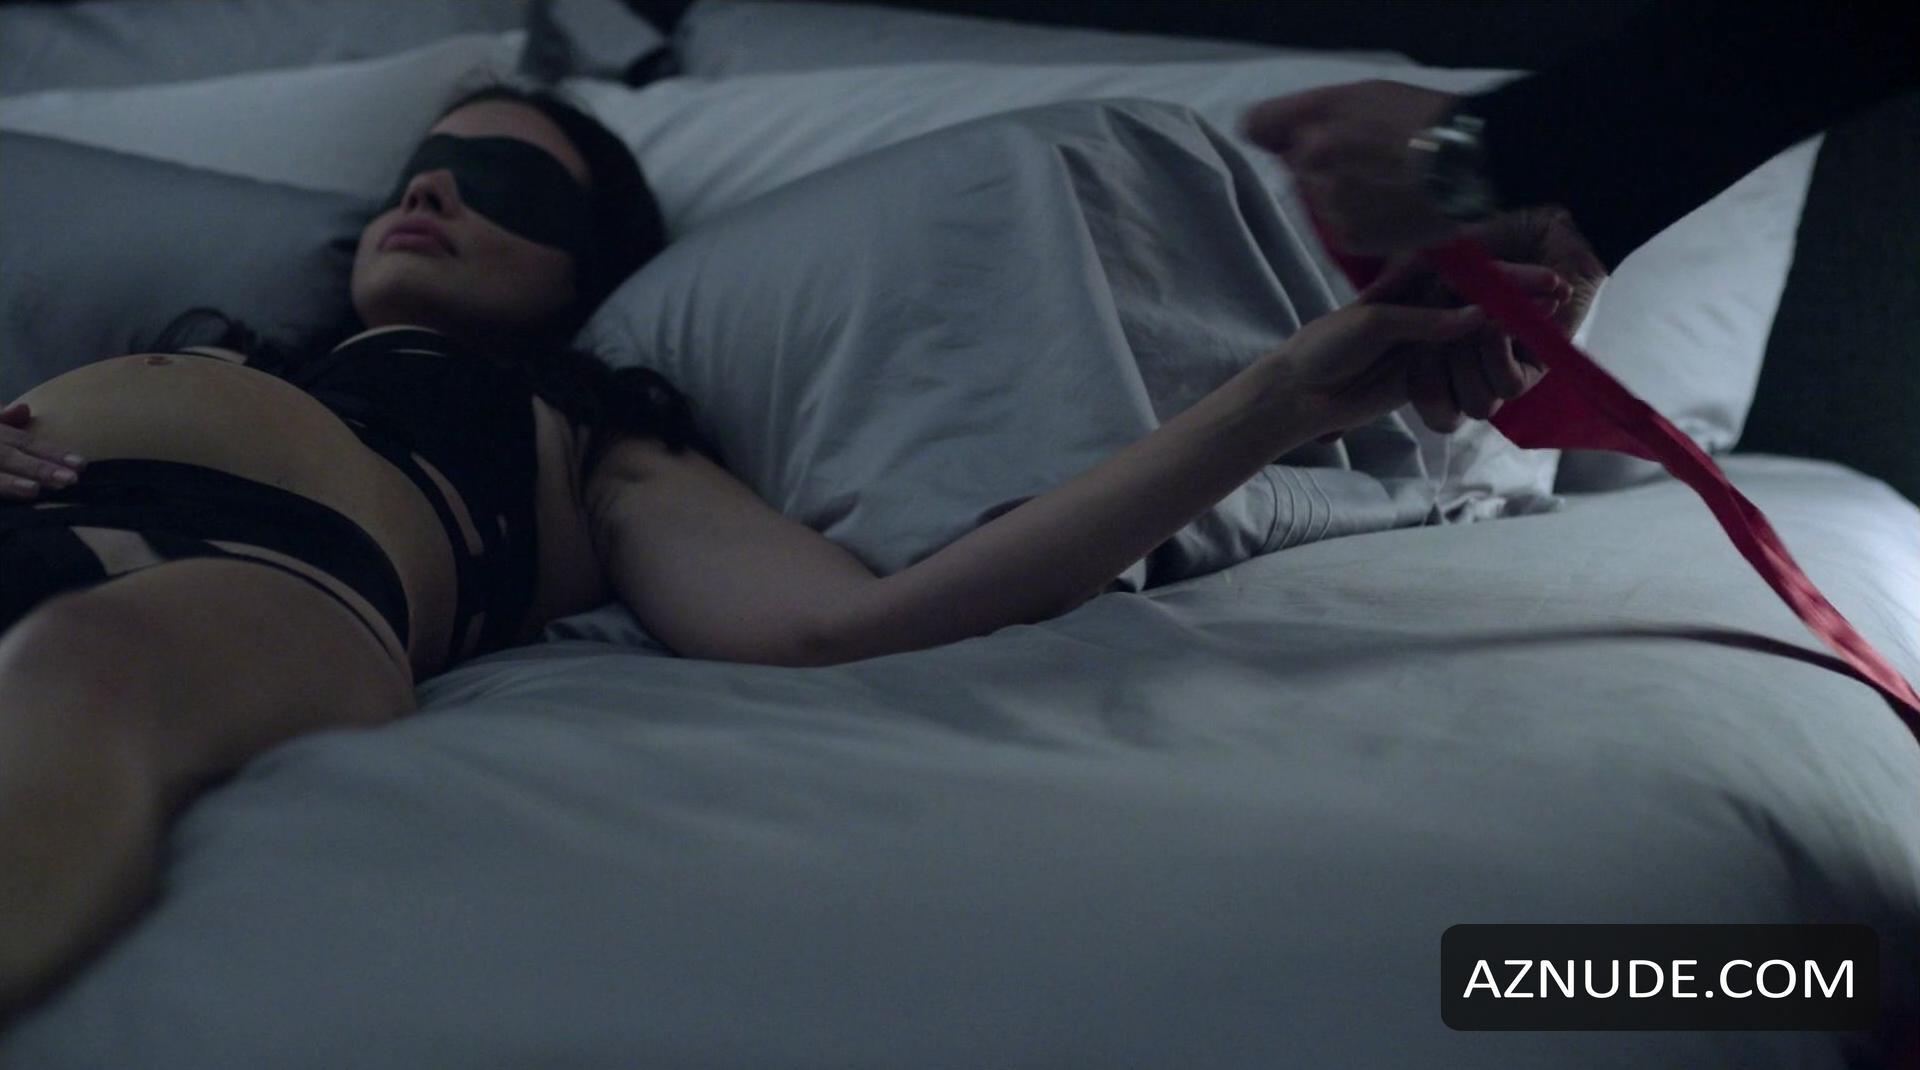 Angelina jolie nude tits in 039foxfire039 on scandalplanetcom - 1 part 10